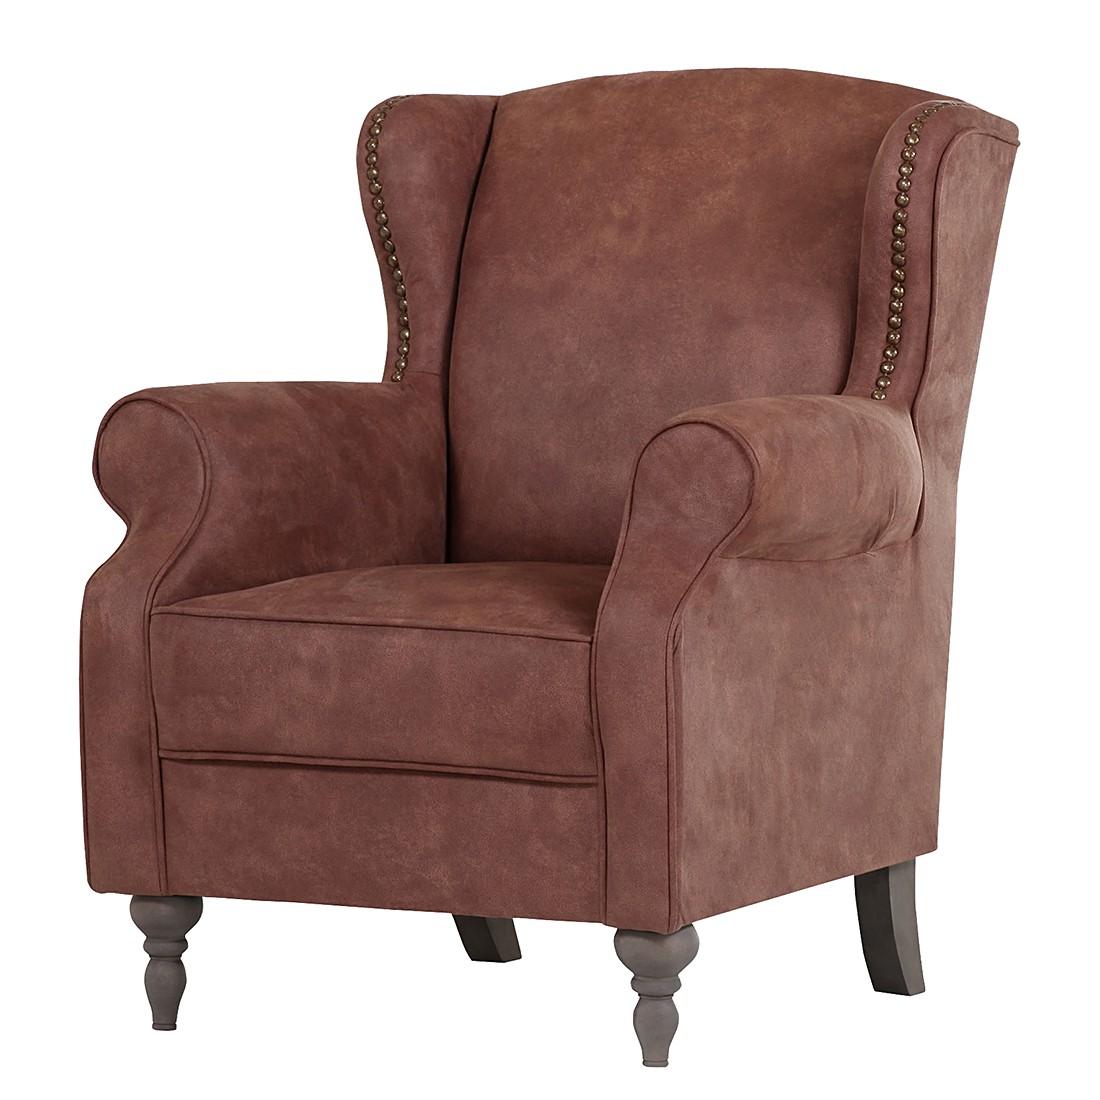 fauteuil oreilles cosimo i microfibre marron gris. Black Bedroom Furniture Sets. Home Design Ideas